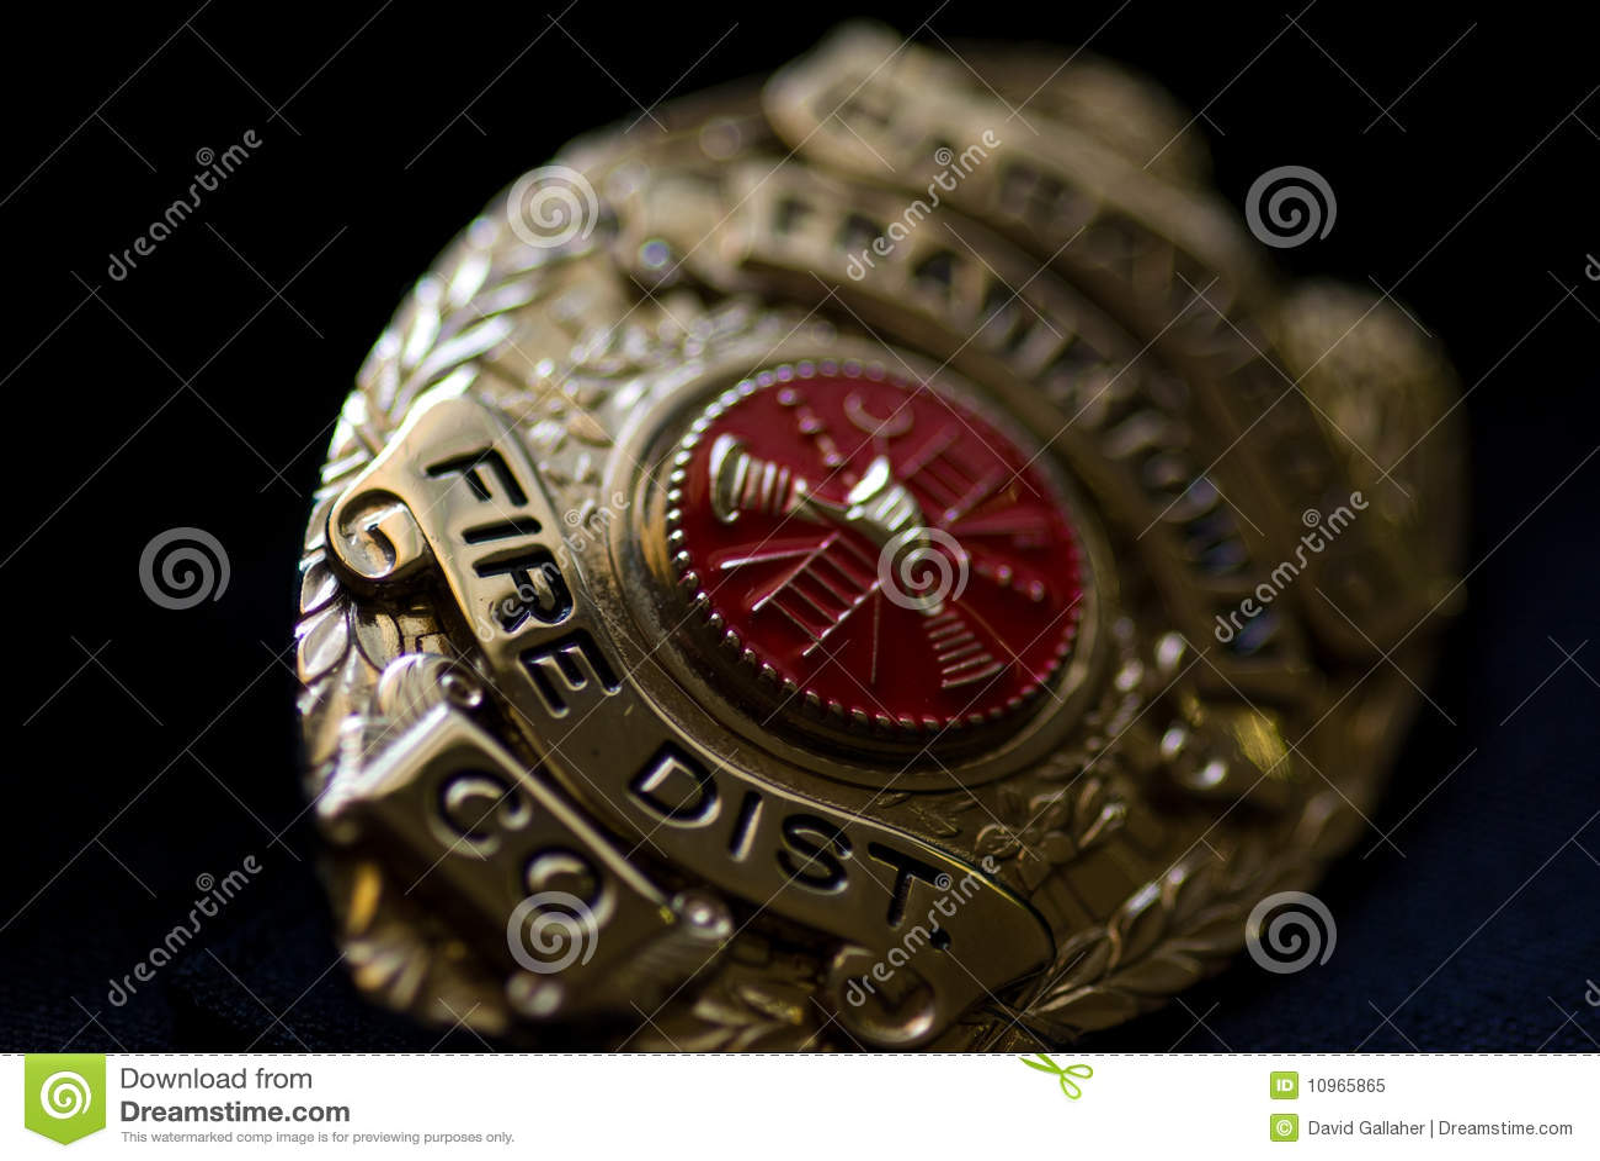 Emblema do departamento dos bombeiros